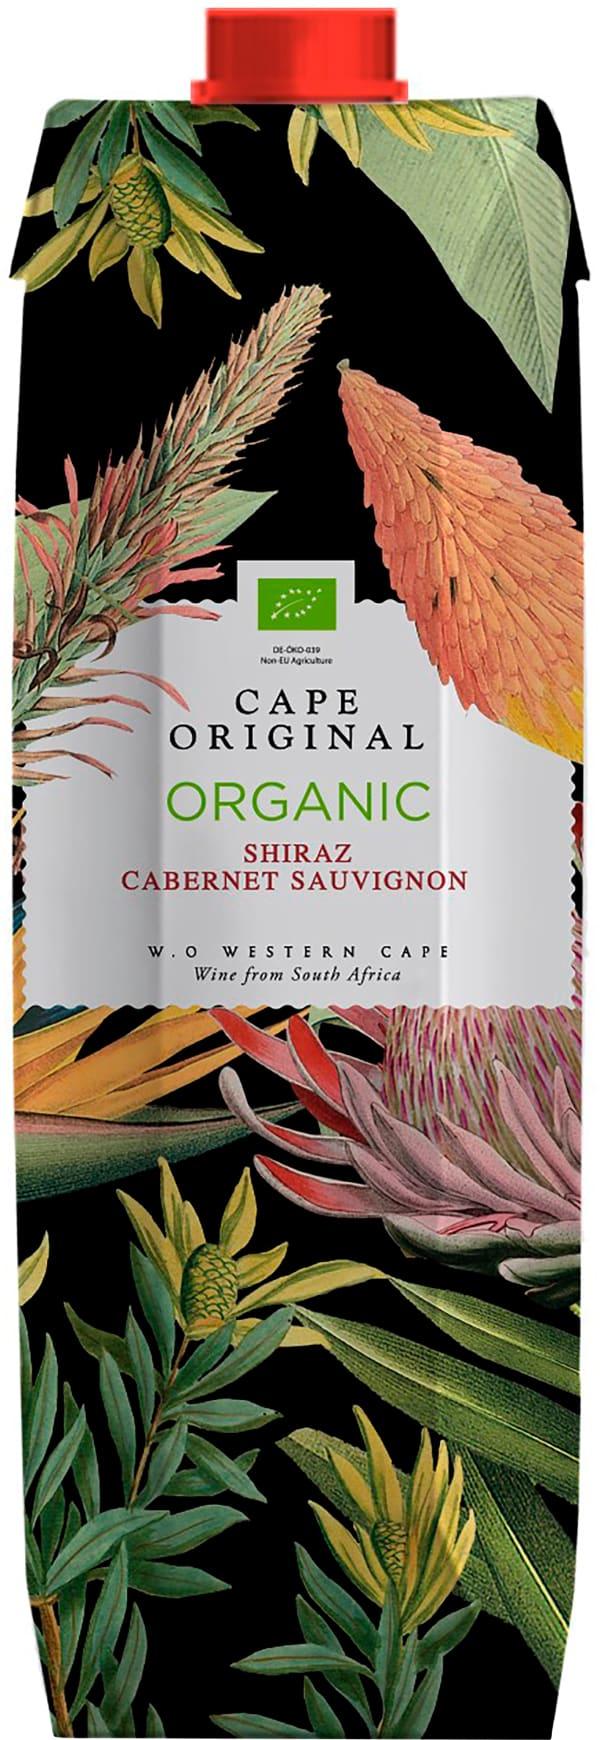 Cape Original Shiraz Cabernet Sauvignon Organic 2017 kartongförpackning